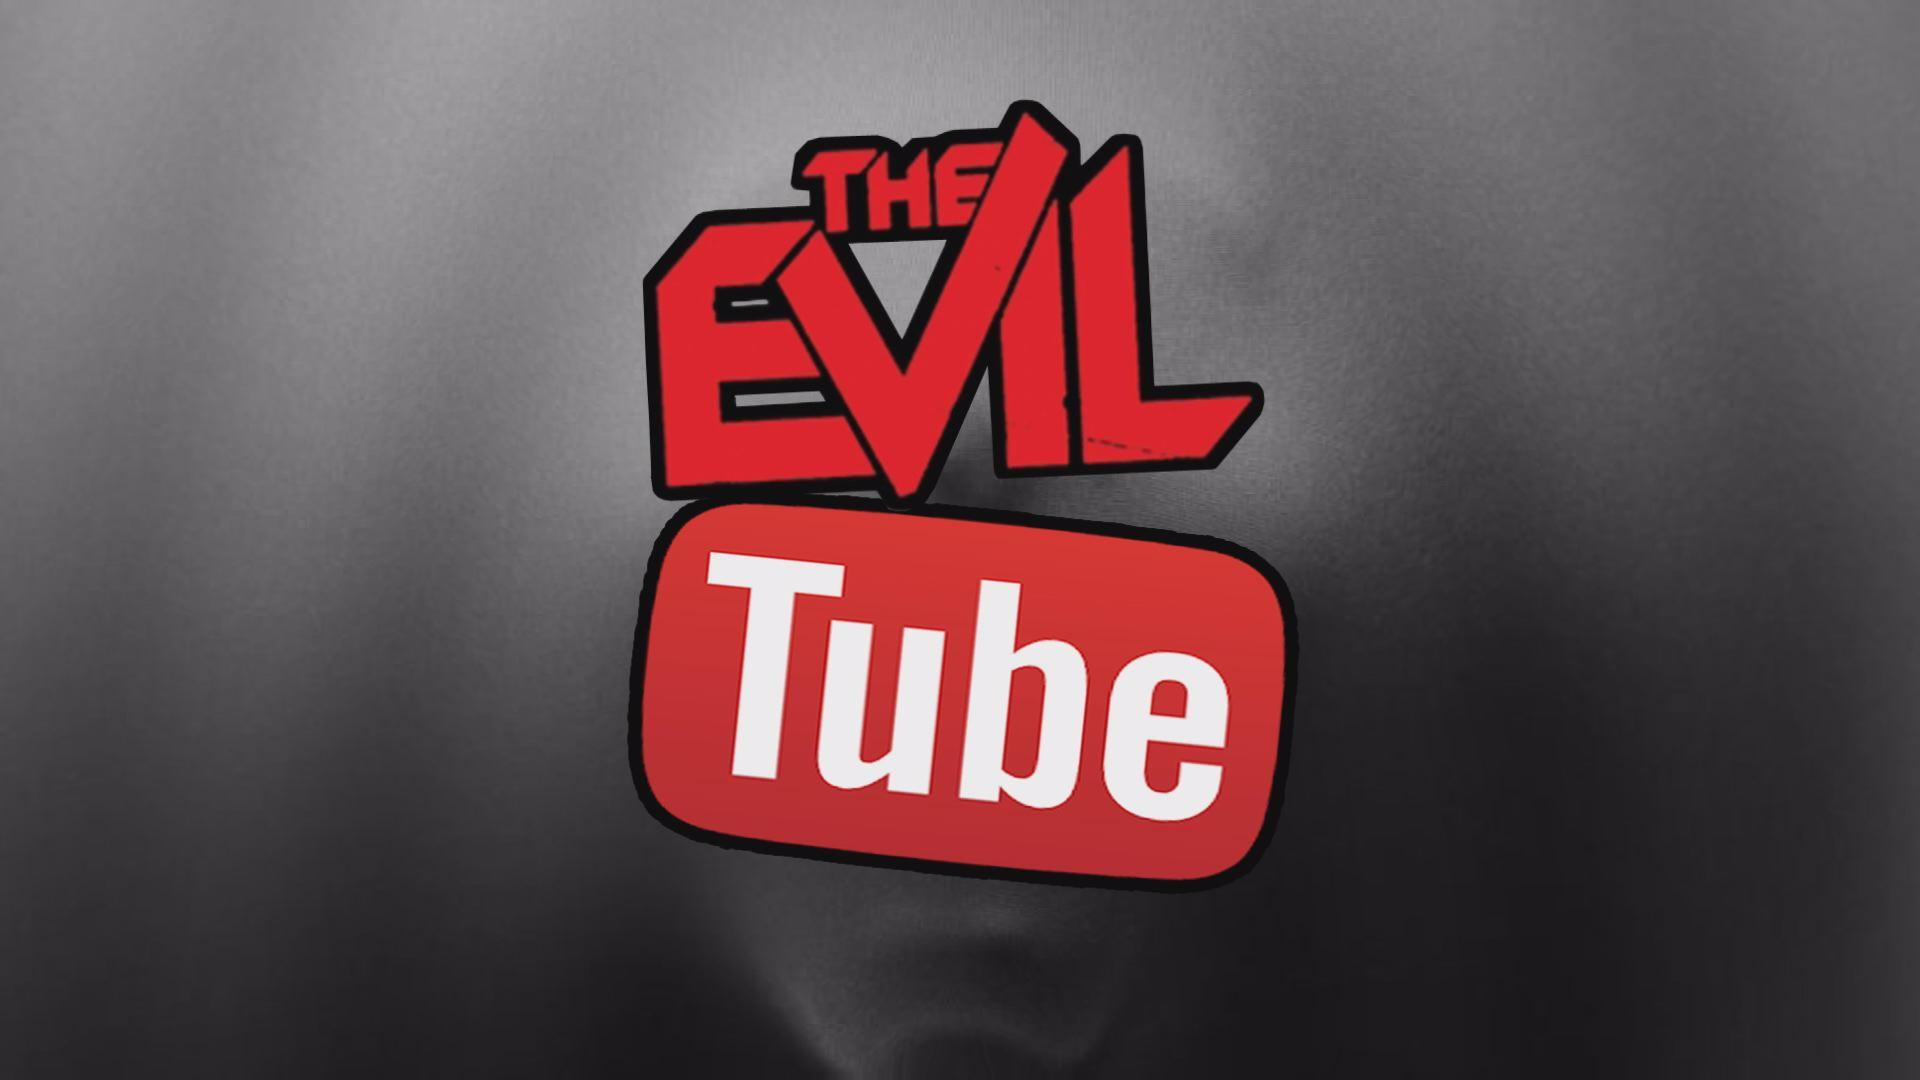 The EvilTube (Shining)